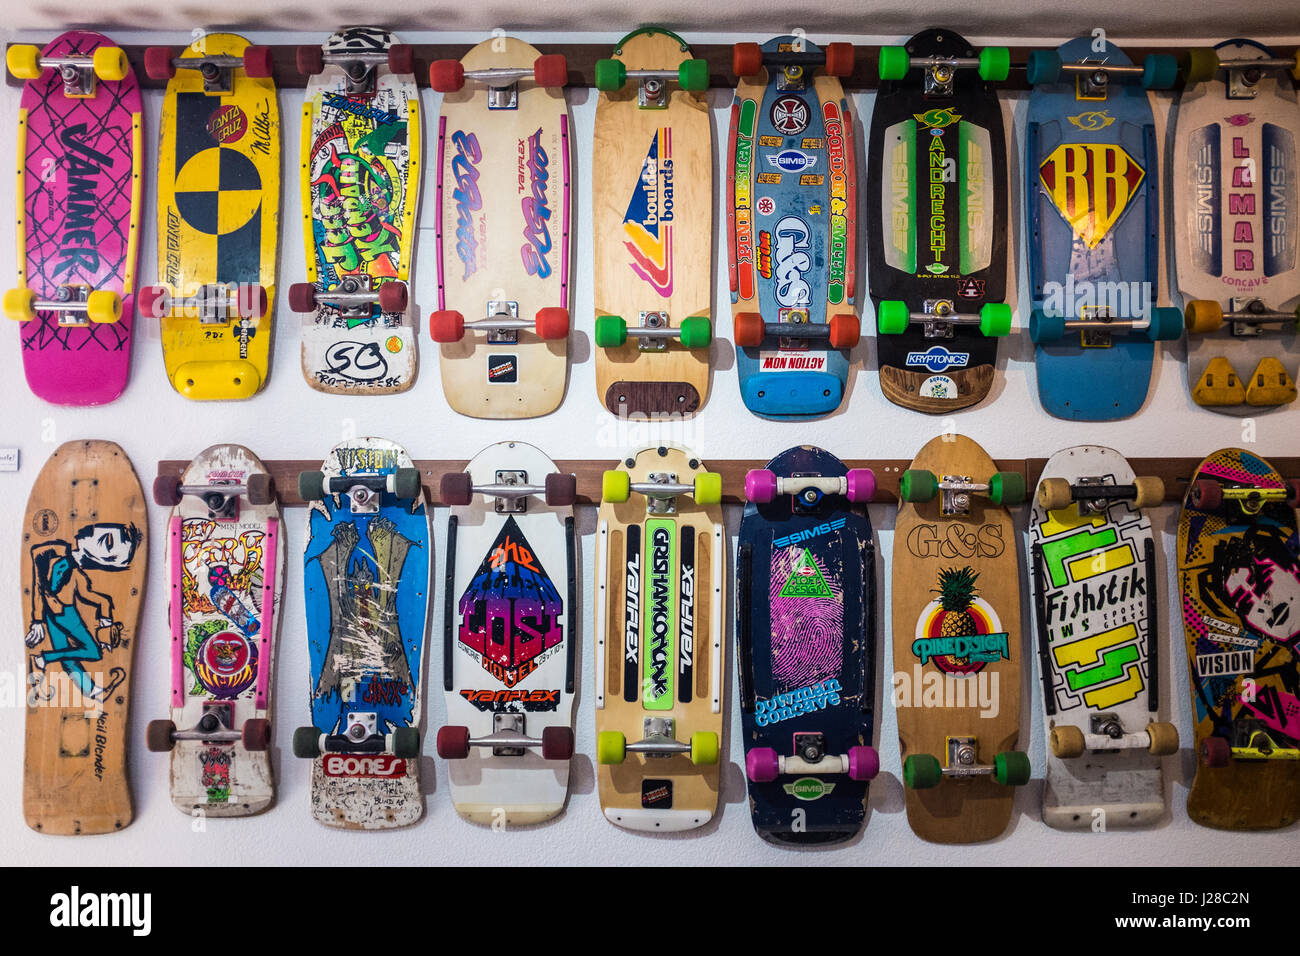 Skateboard Museum, Morro Bay, California - Stock Image